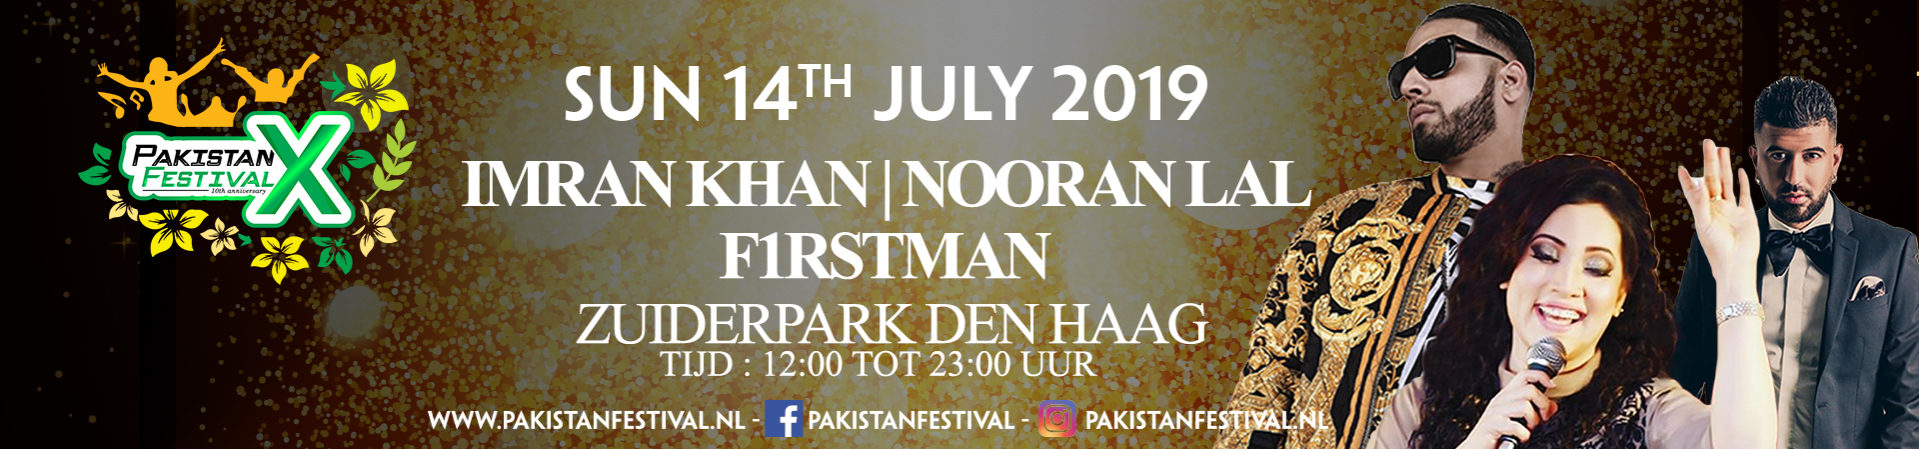 Pakistan Festival